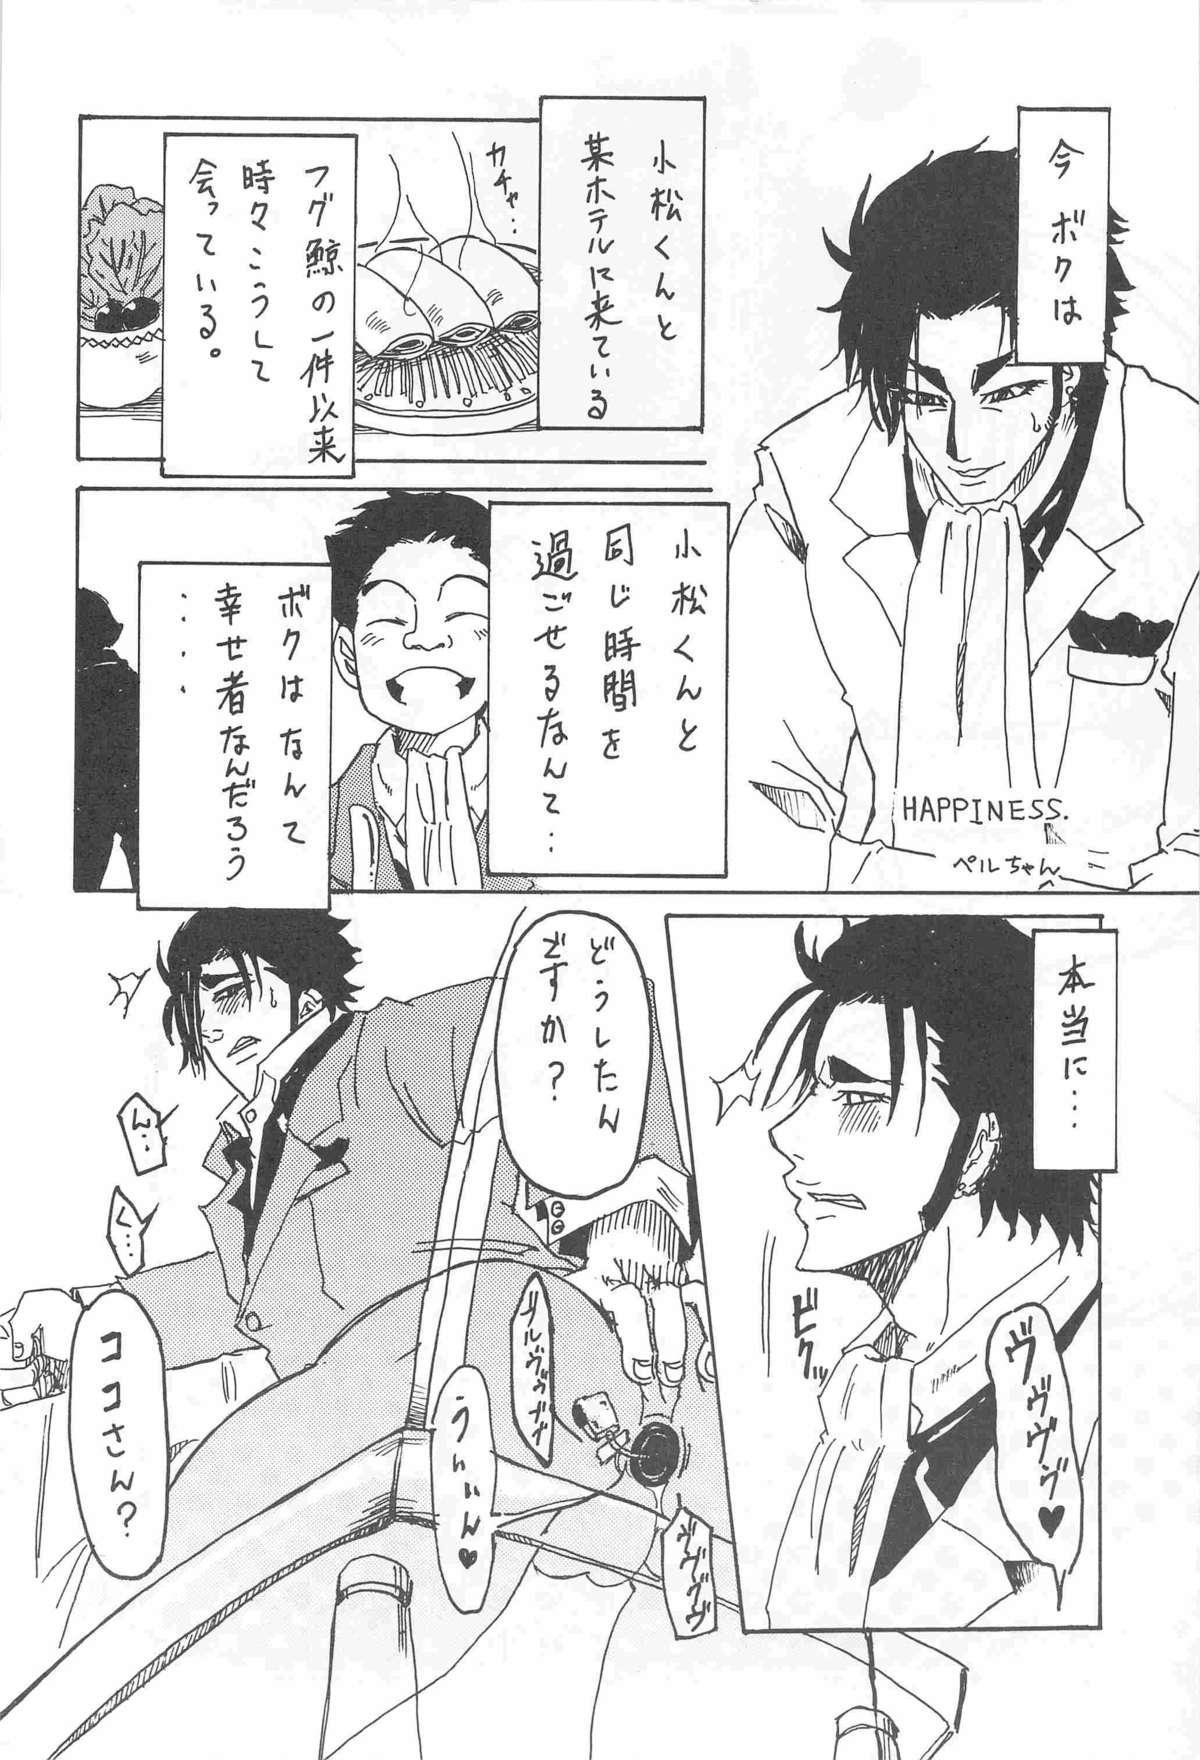 [Kijima Hyougo,Jun'ai Meringue-don,RIN!] [msbt] (Toriko) 3